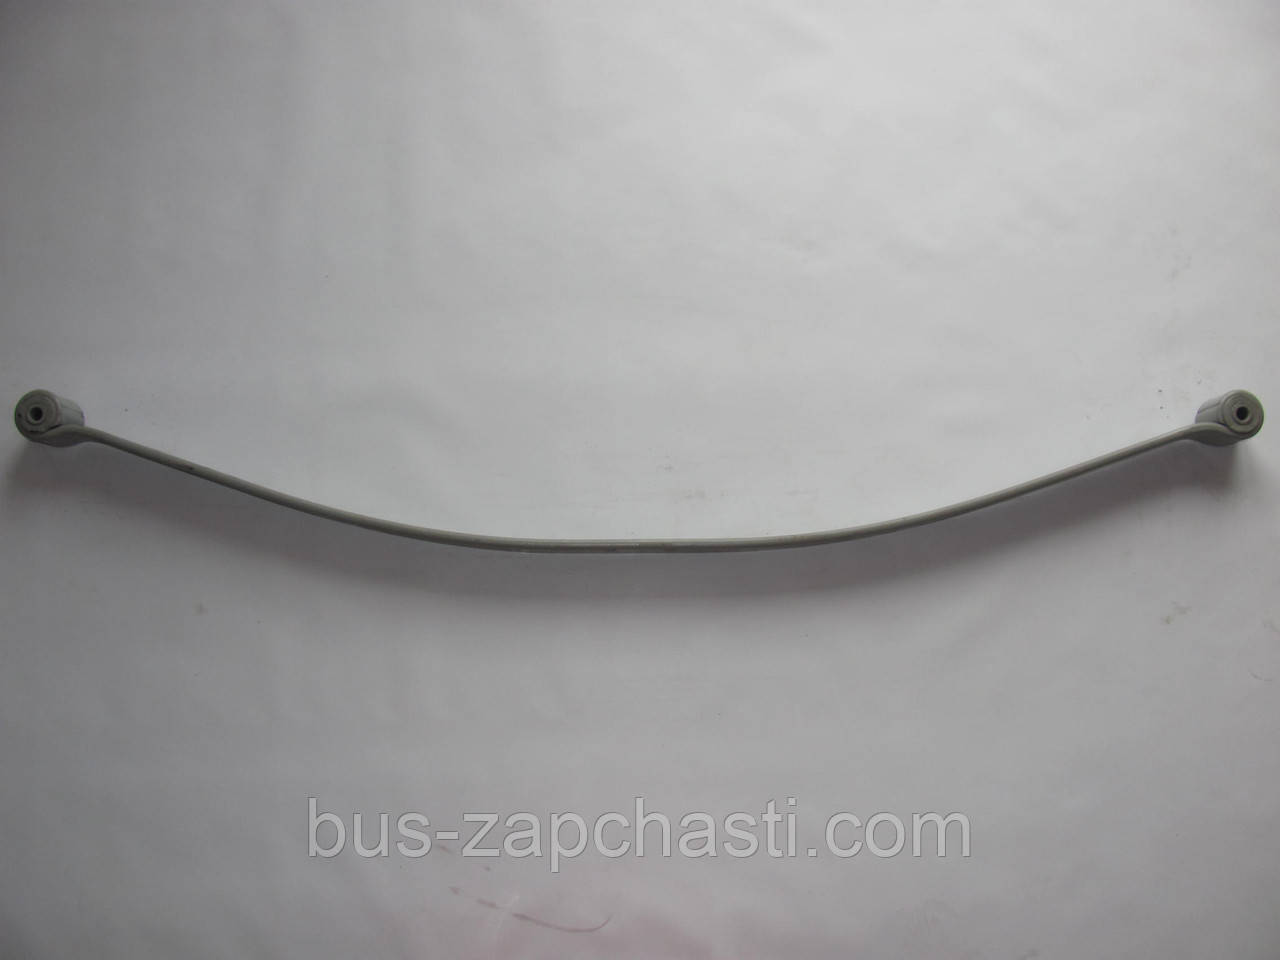 Коренной лист – SVENSSON – на MB SPRINTER  408-416 (СПАРКА), VW LT-46  1996-2006 – F020T680ZA01